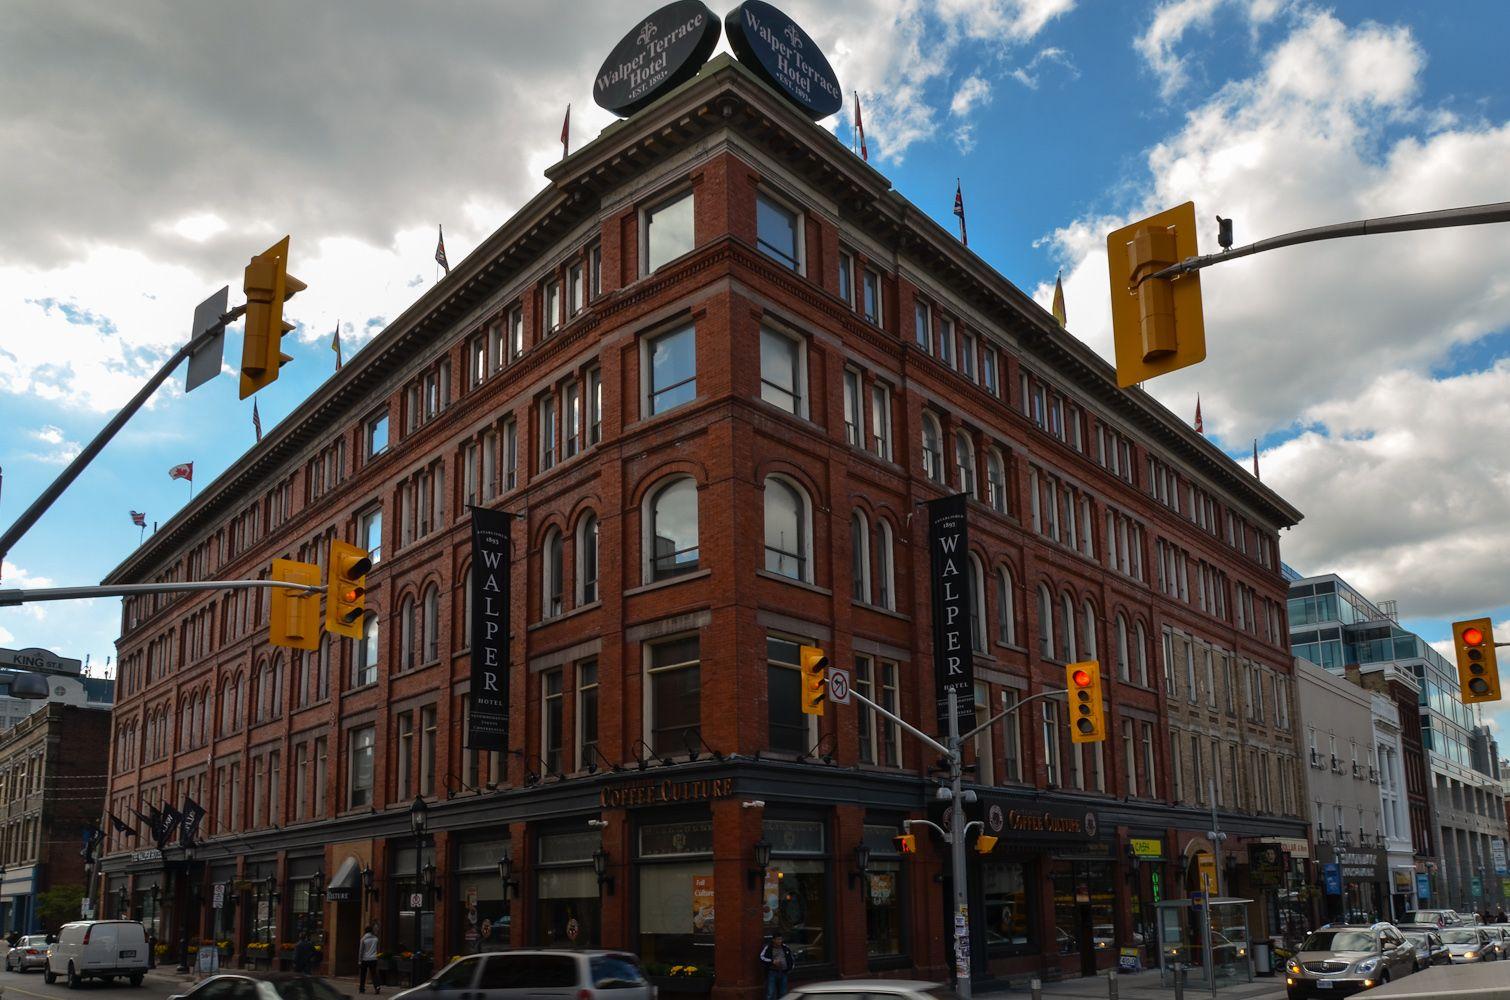 Walper Terrace Hotel in Kitchener, Ontario | oh Canada | Pinterest ...